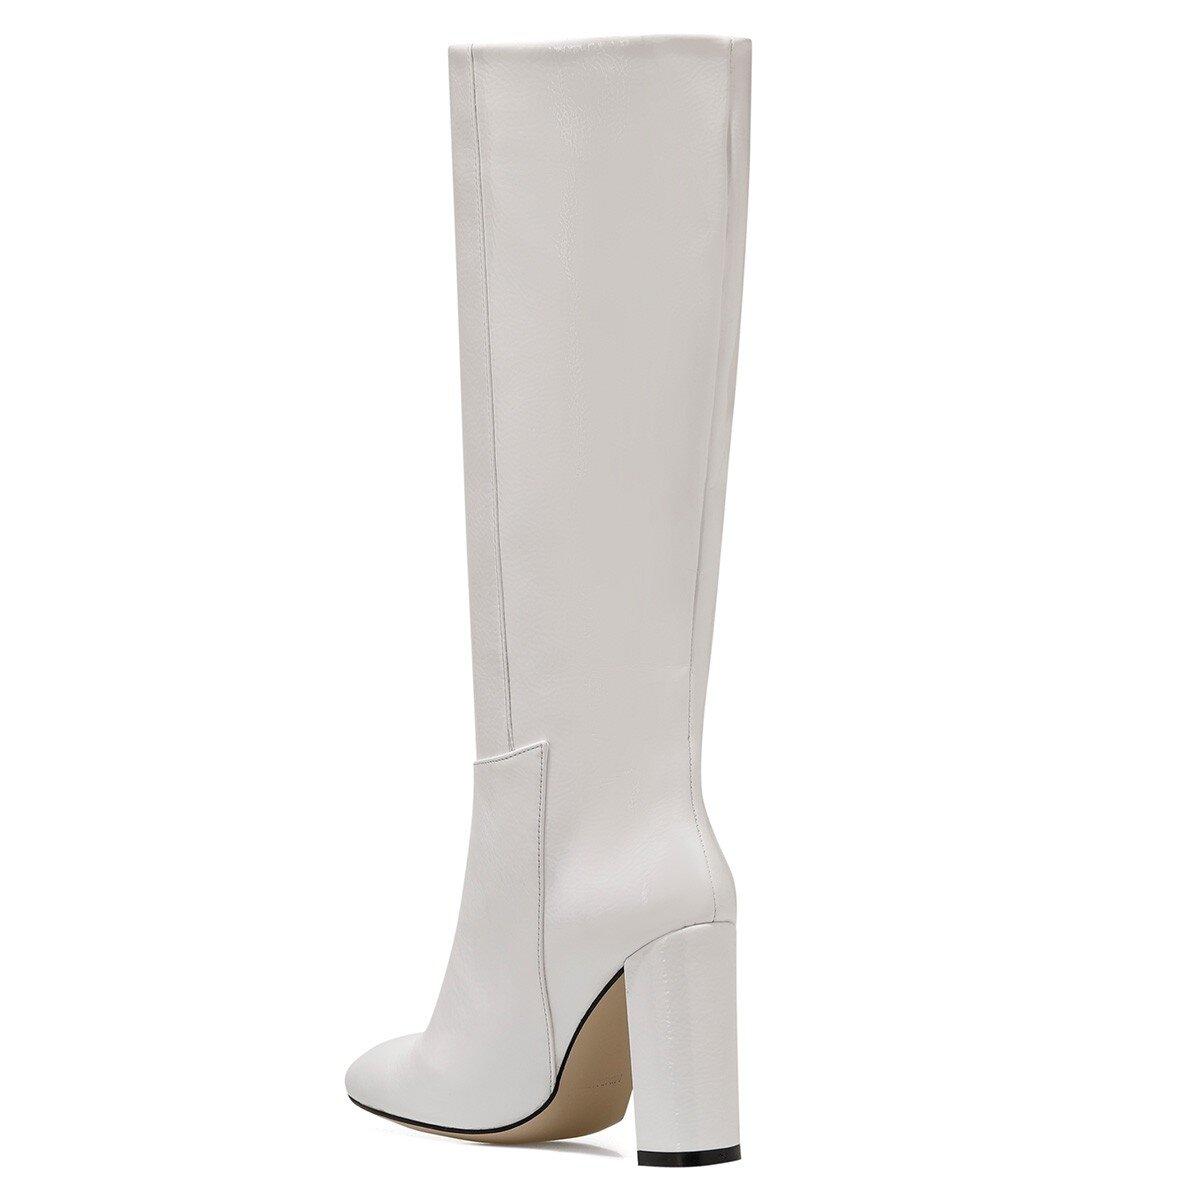 MIMA Beyaz Kadın Topuklu Çizme